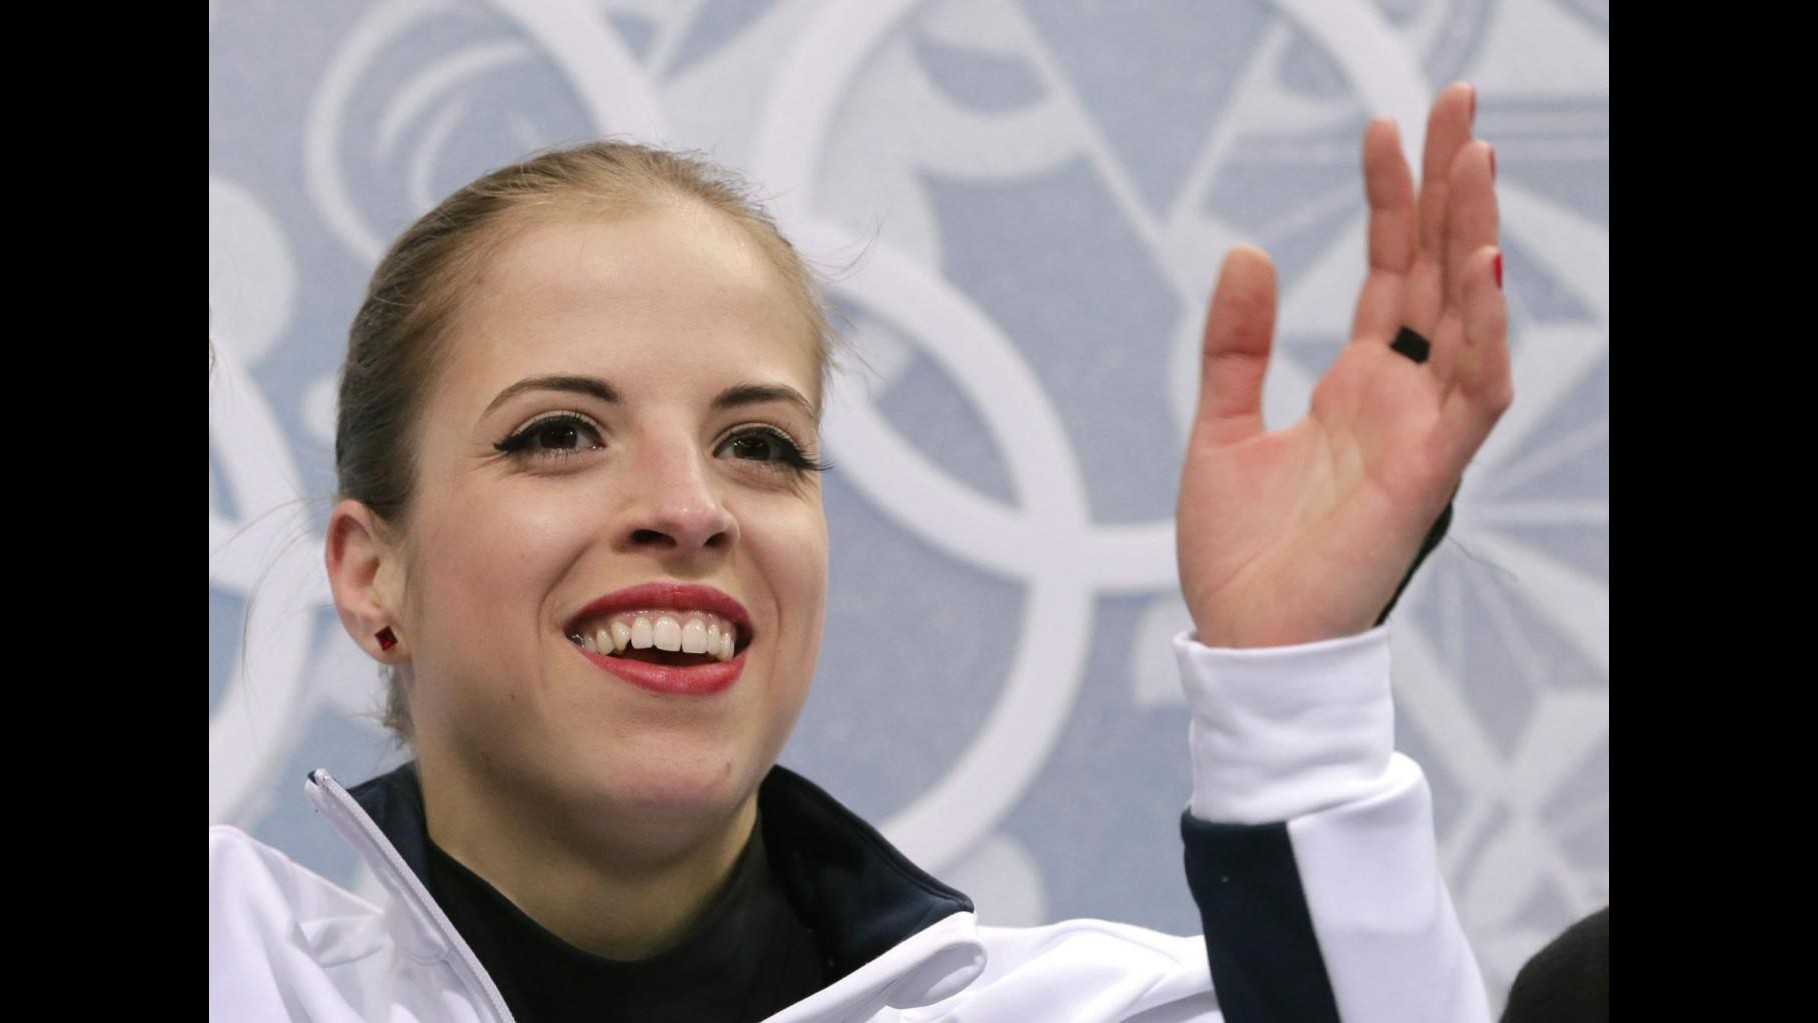 Pattinaggio figura, Carolina Kostner vince bronzo nell'individuale ai Mondiali